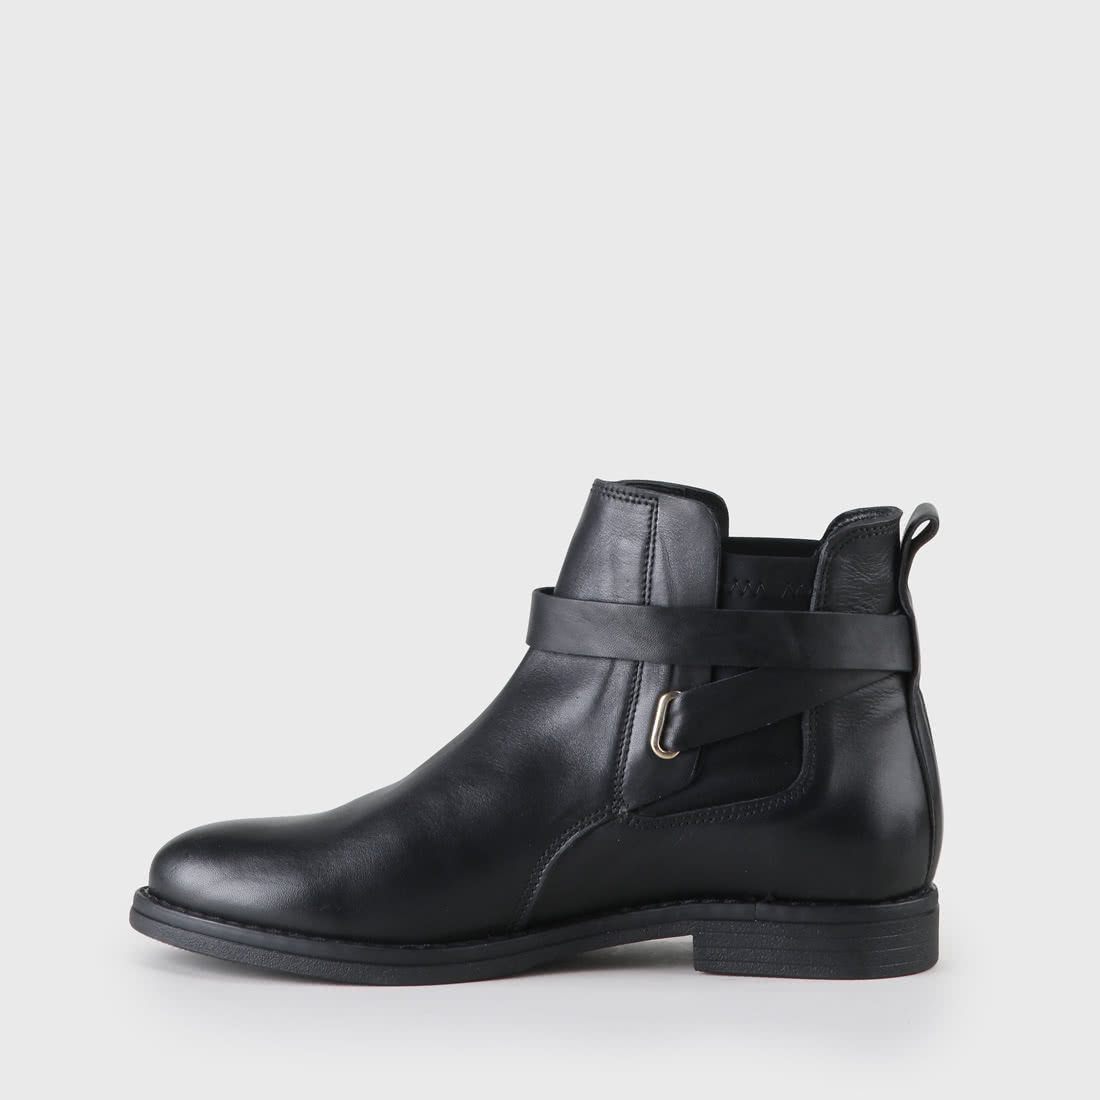 Aqua Sky Ankle Boots nappa leather cognac